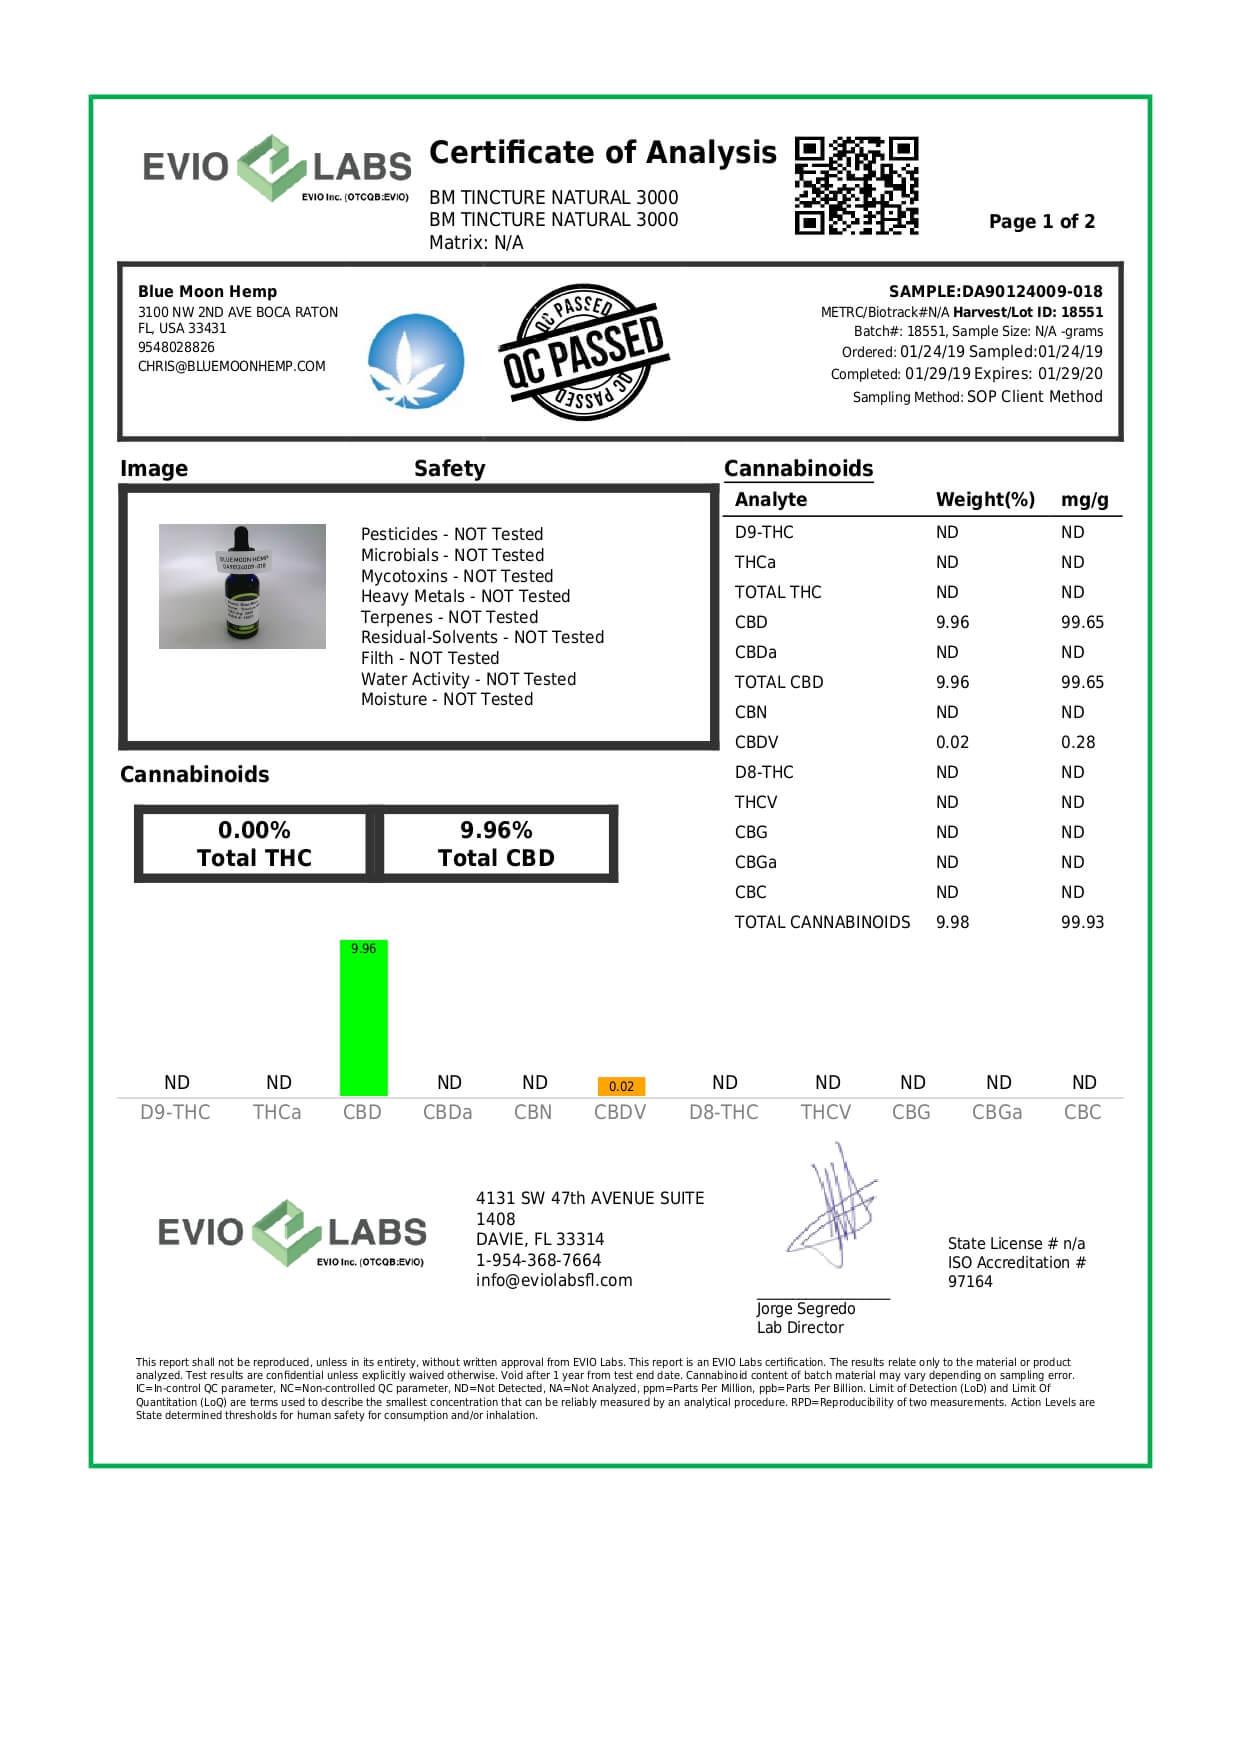 Blue Moon Hemp CBD Tincture Tru Blu Natural 3000mg Lab Report